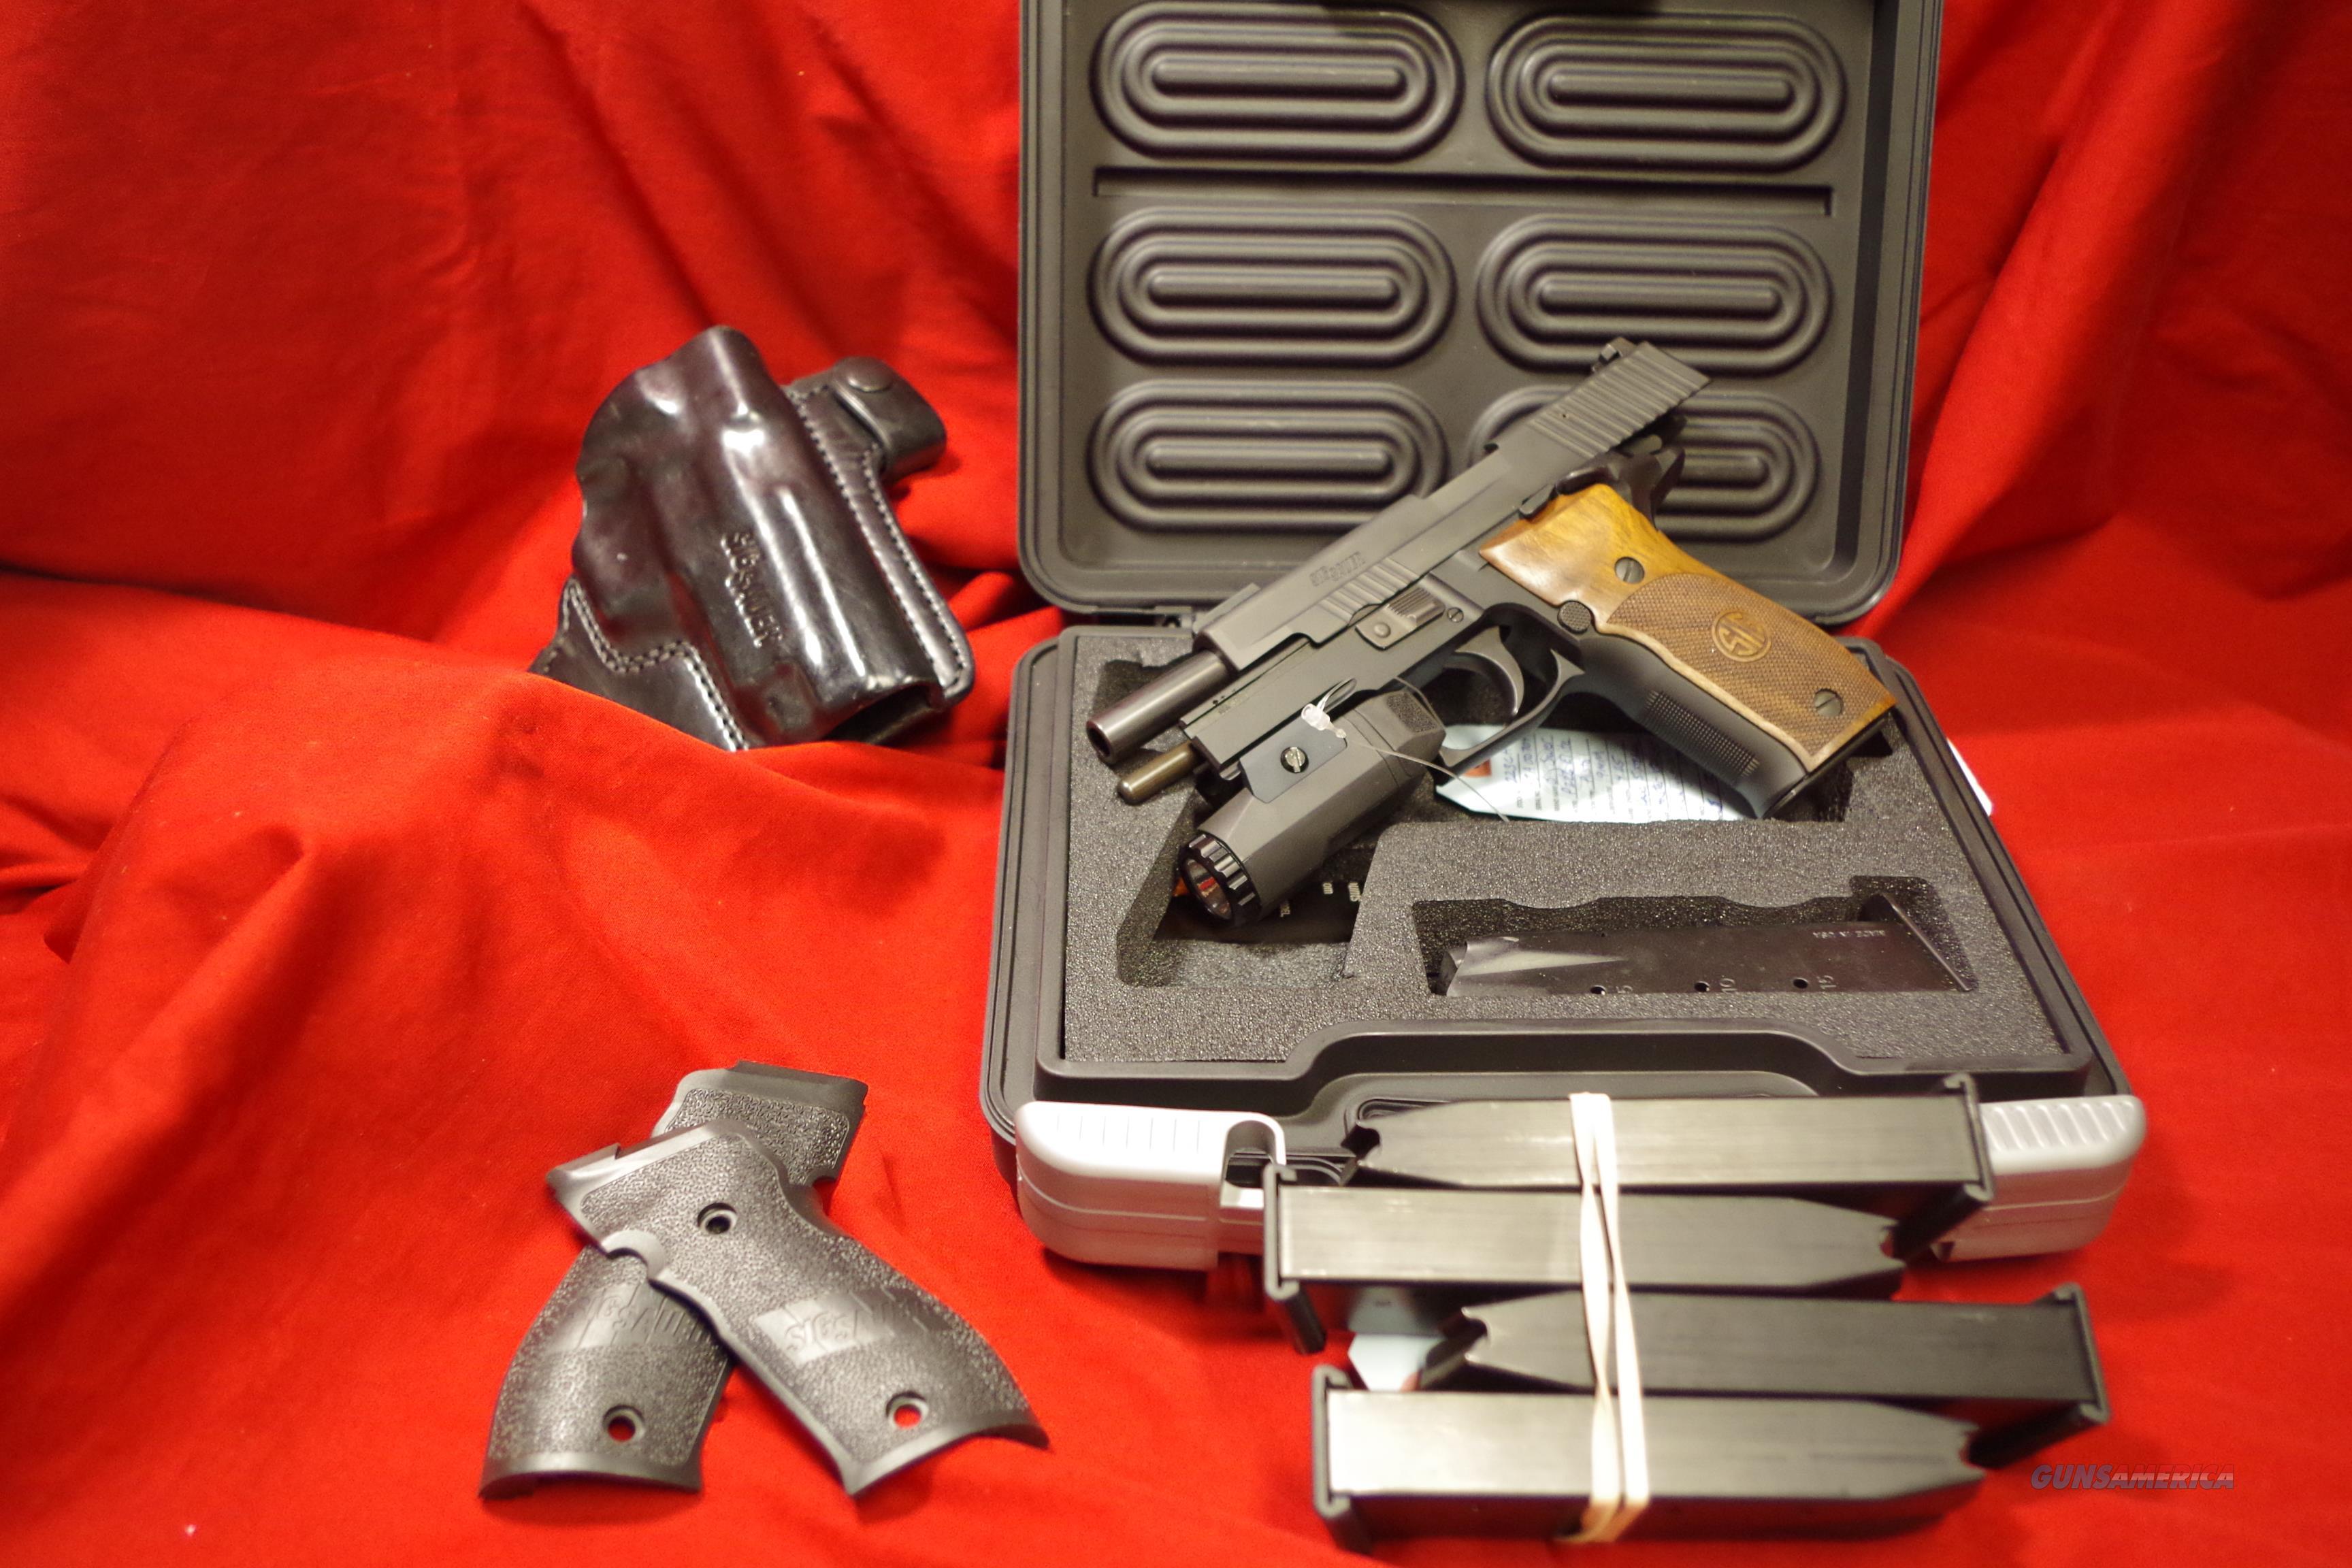 -REDUCED- SIG SAUER P226 Elite 9mm pistol w/extra gear  Guns > Pistols > Sig - Sauer/Sigarms Pistols > P226